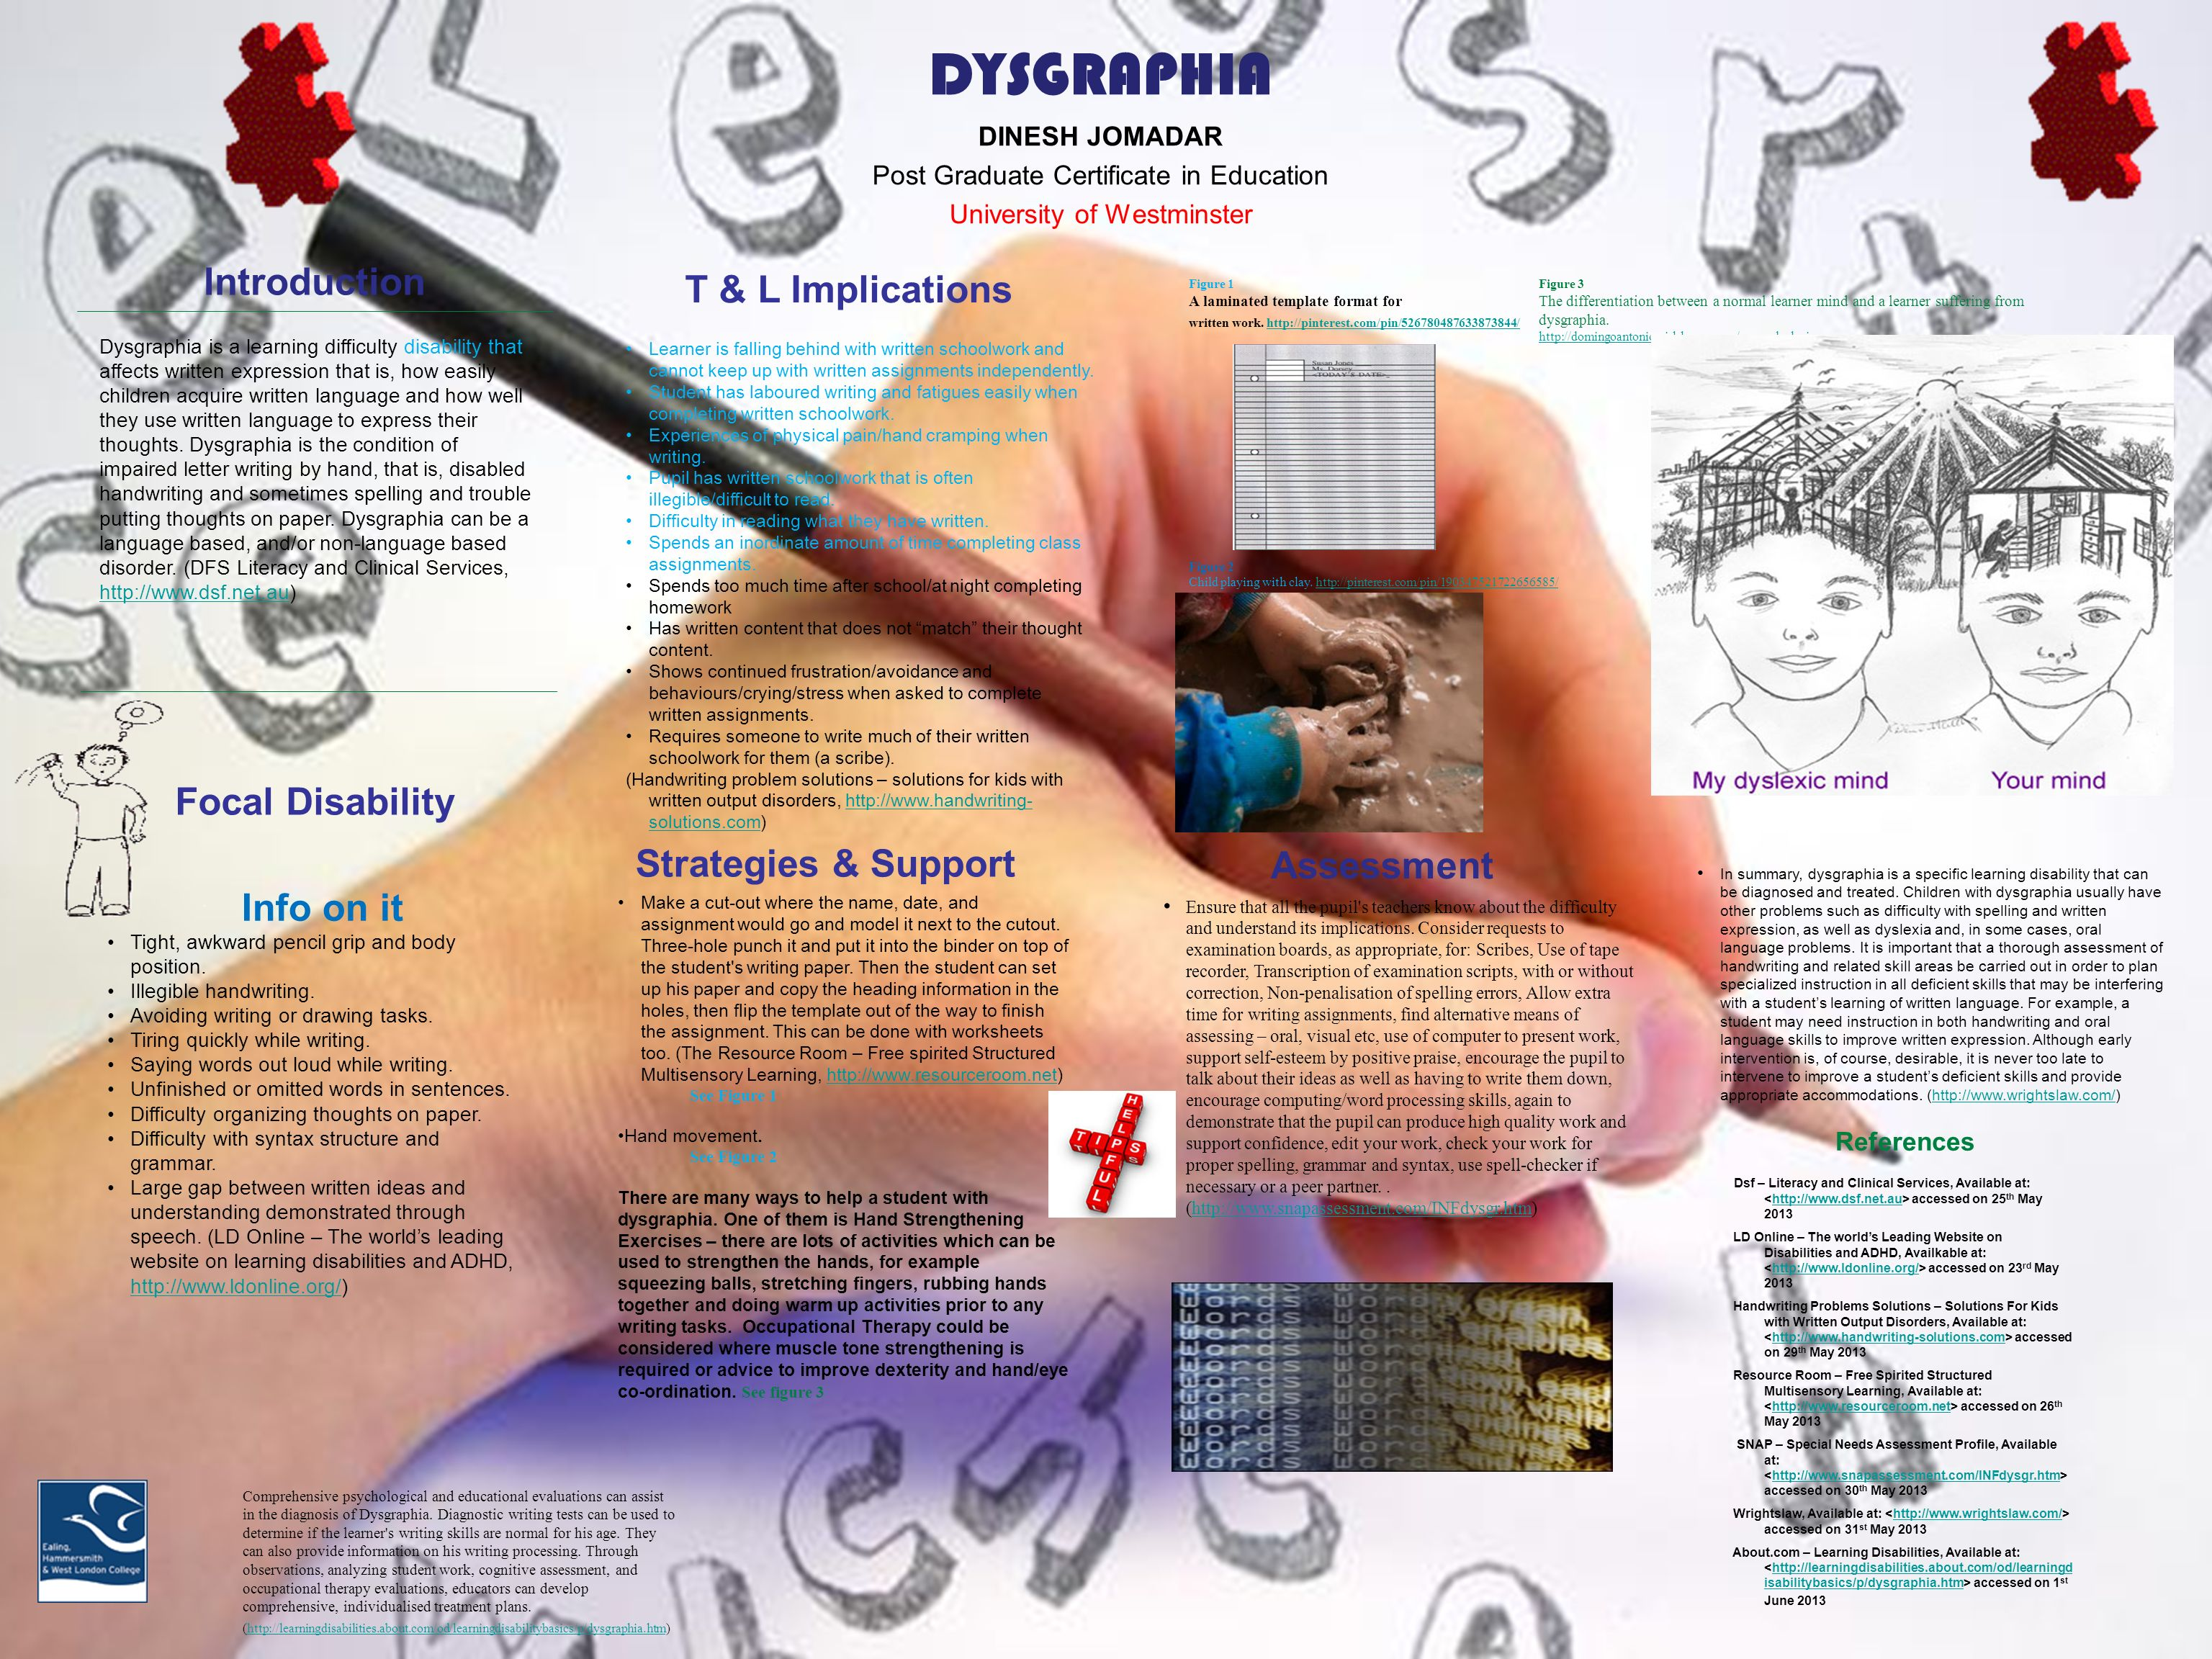 Dysgraphia Dinesh Jomadar Post Graduate Certificate In Education